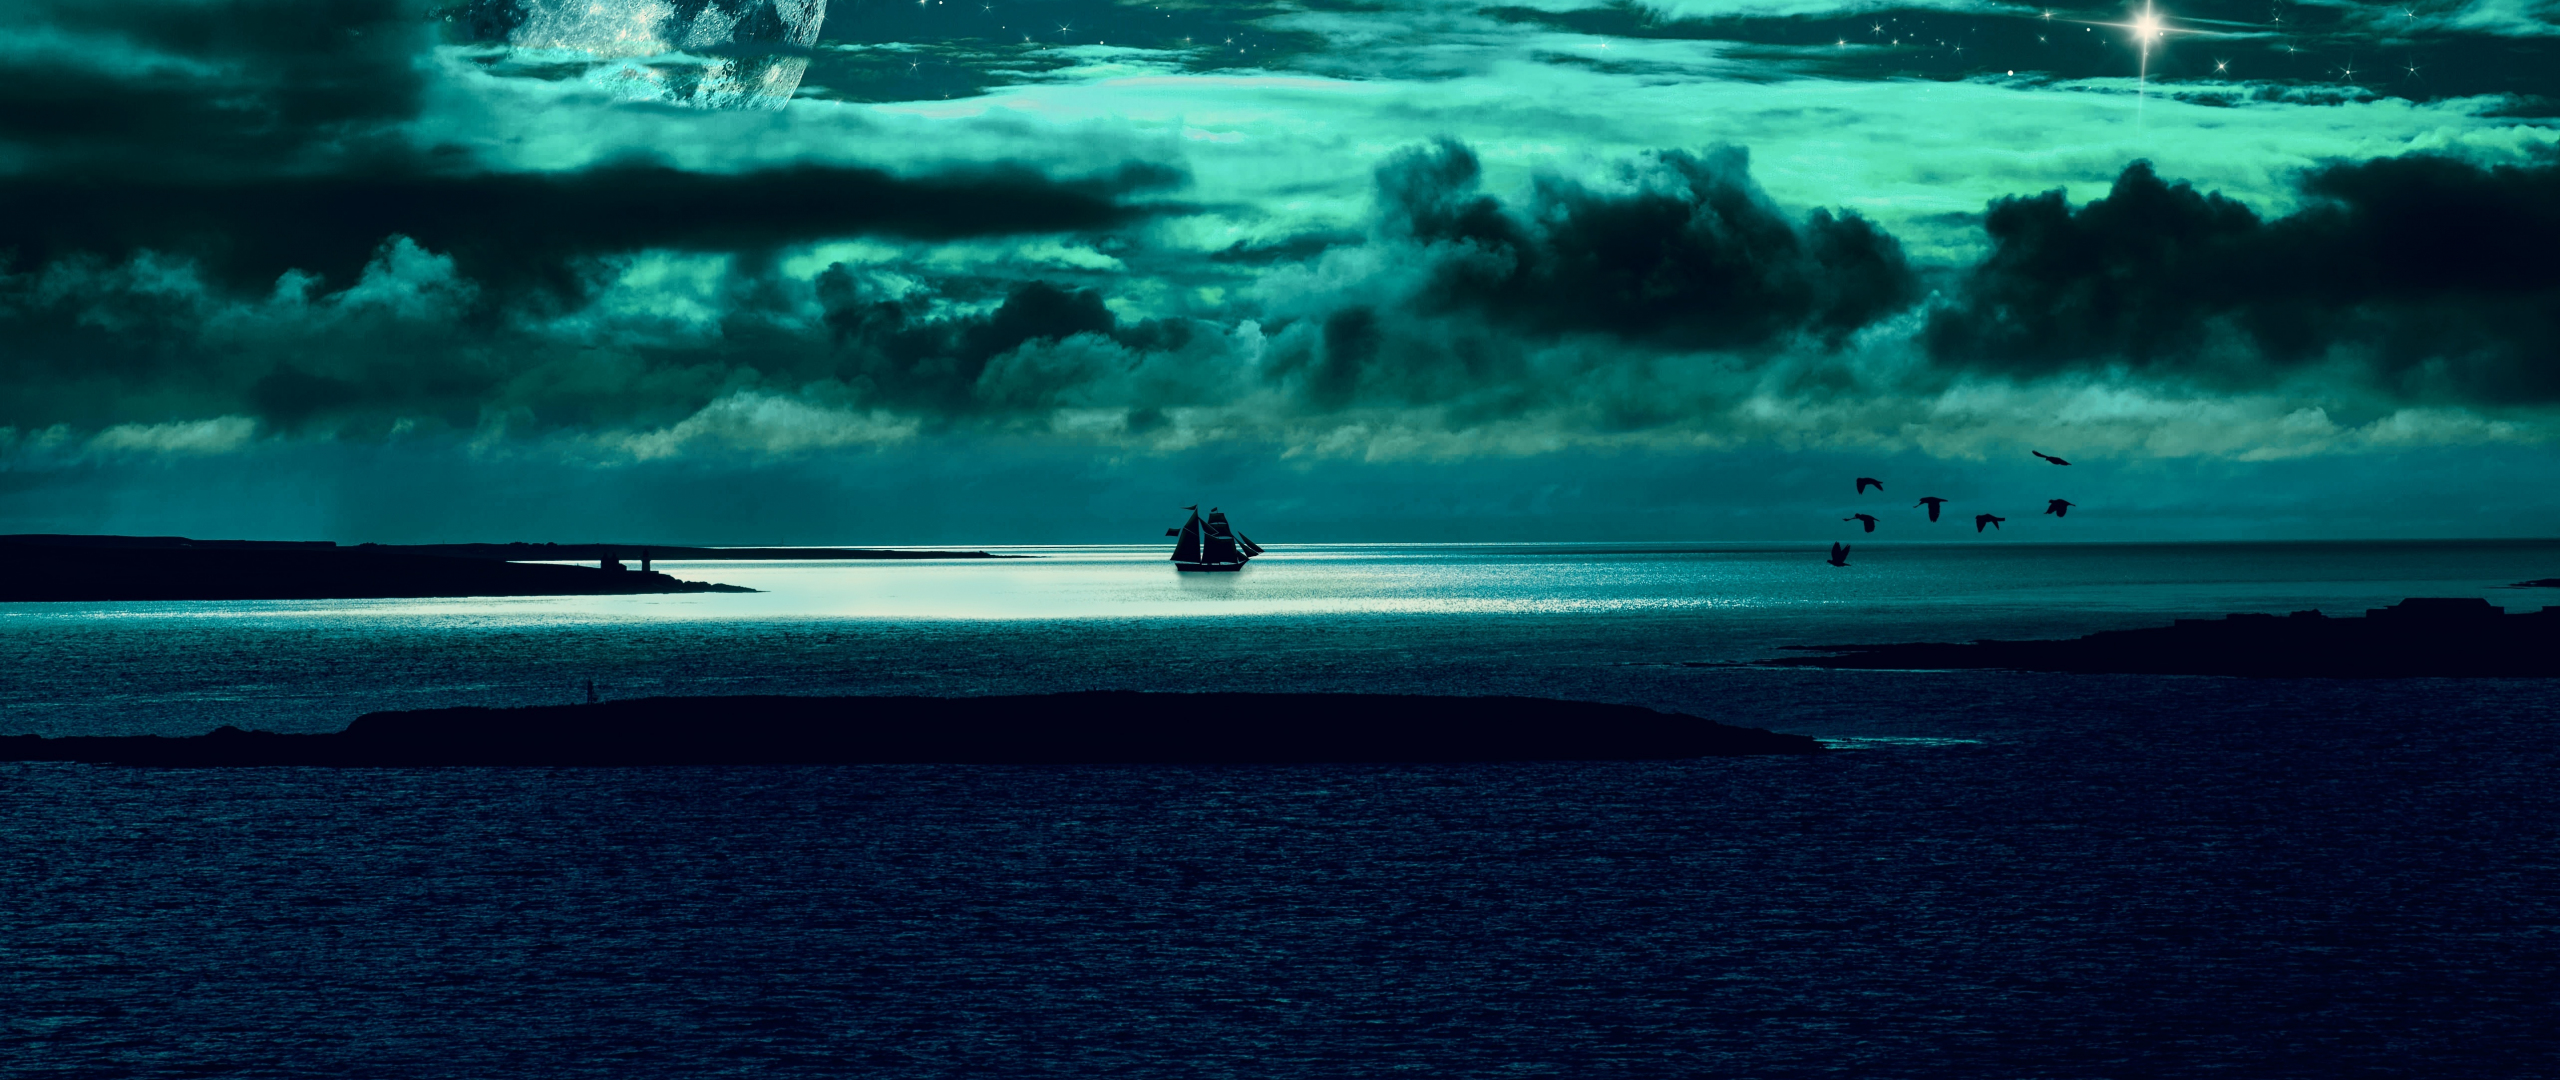 Clouds Body Of Water Sea Night Fantasy 2560x1080 Wallpaper